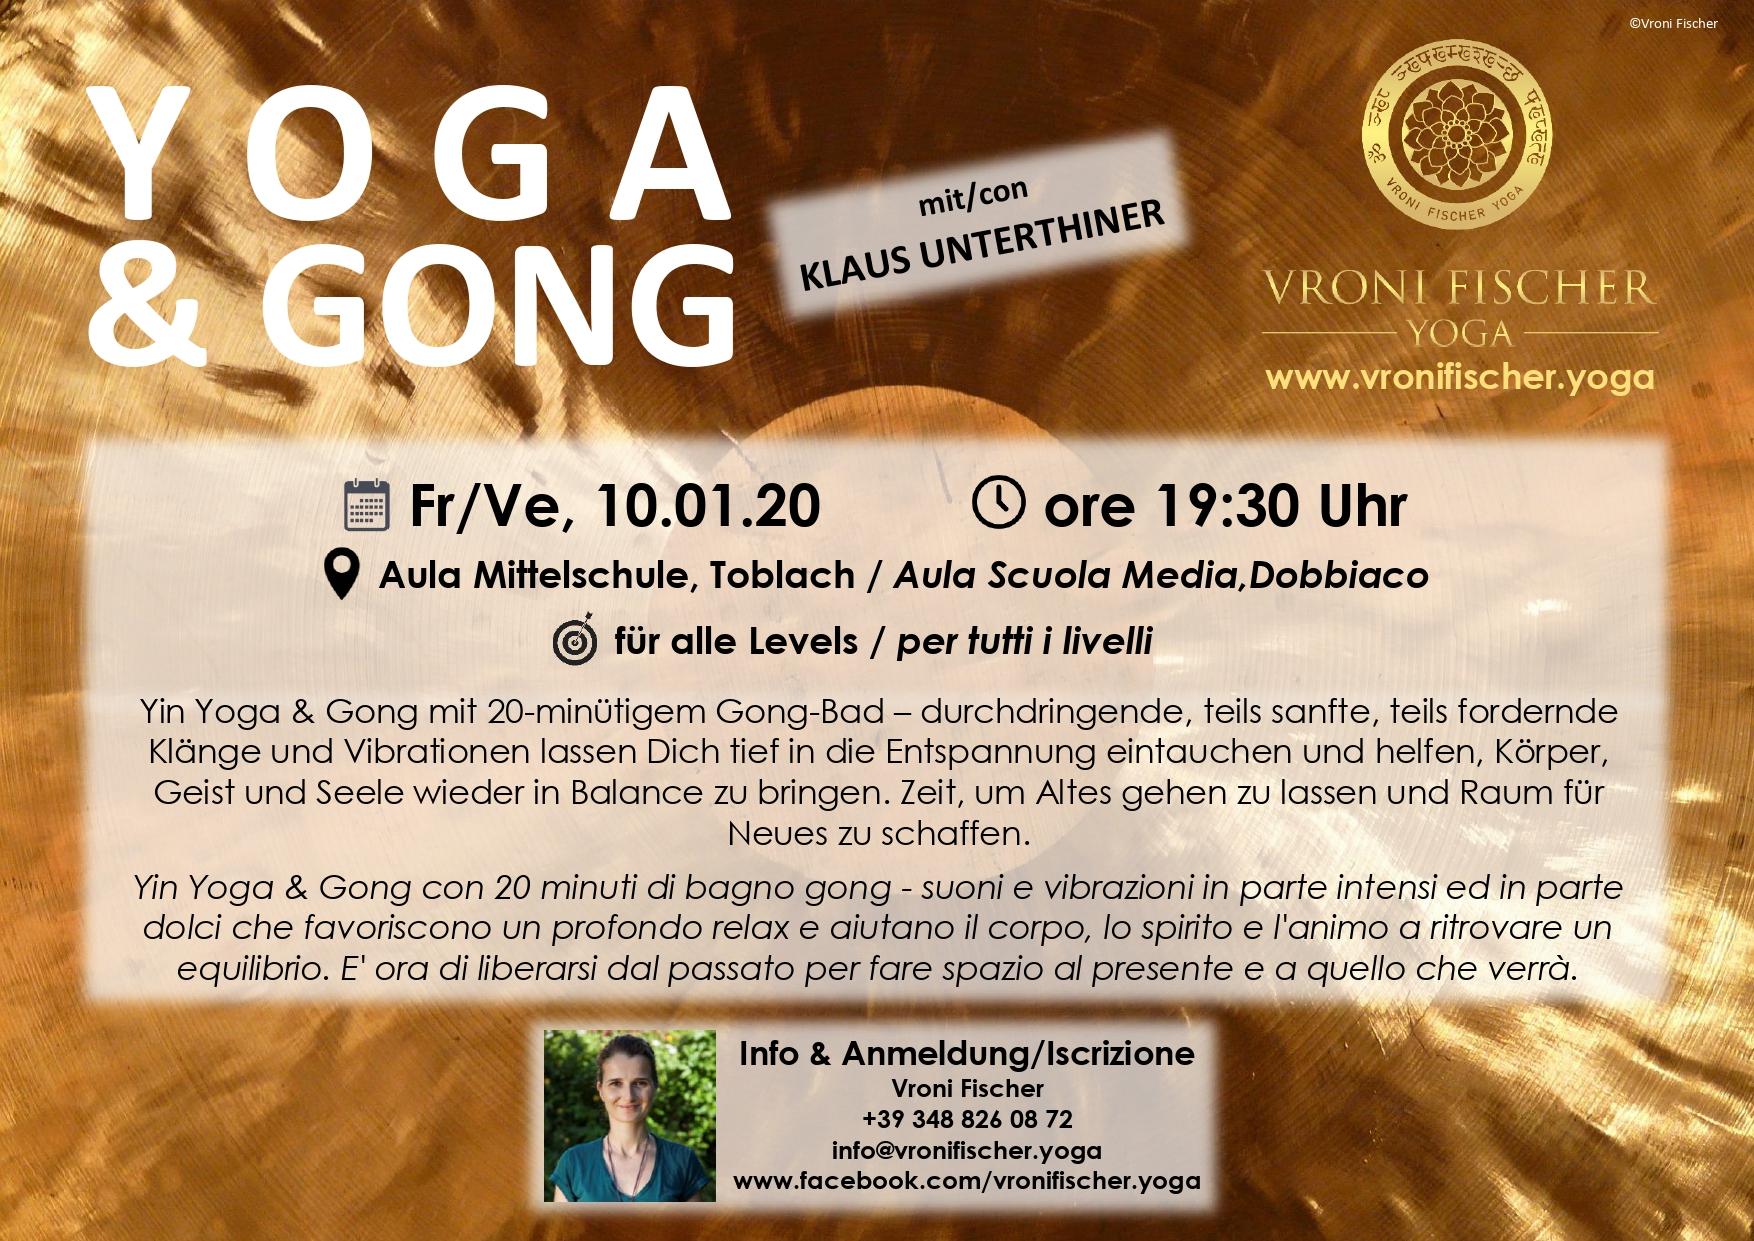 https://www.vronifischer.yoga/events-workshops-retreats-1/events/